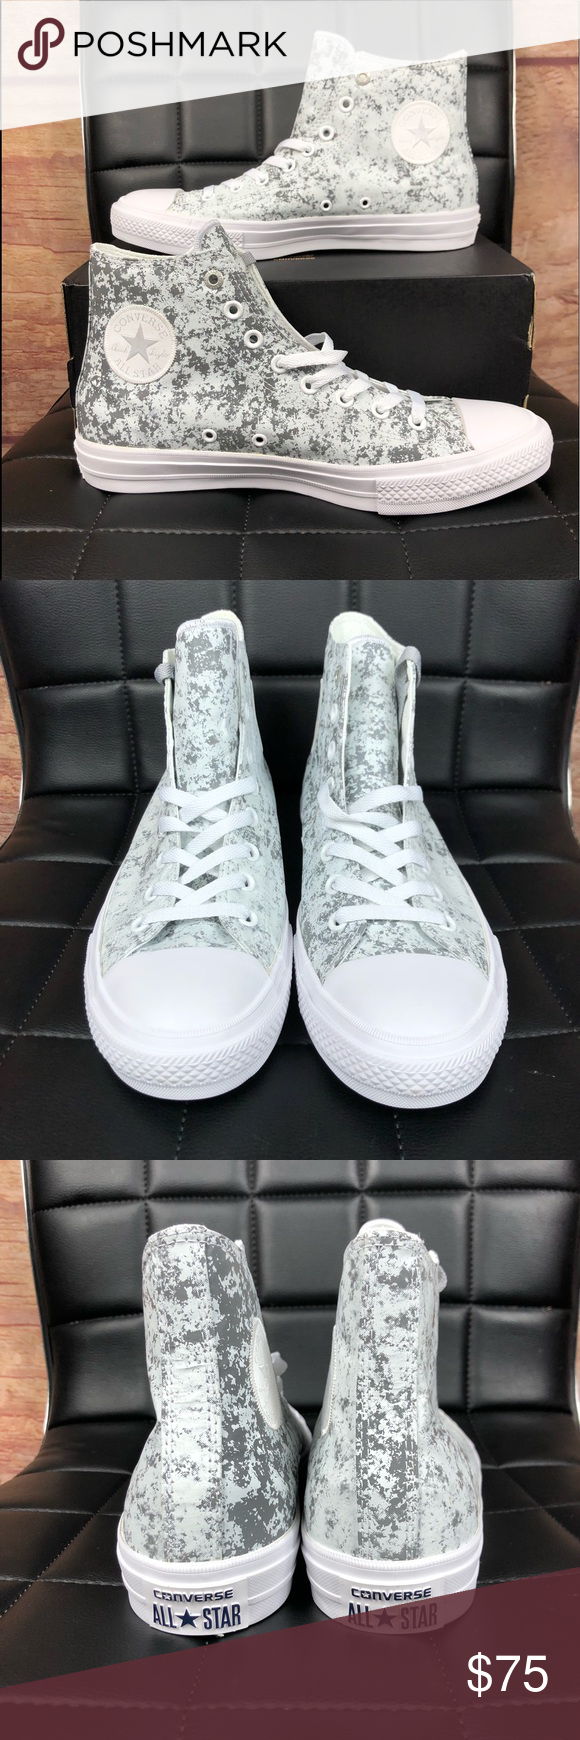 Lunarlon High Top Shoes Chuck Taylor